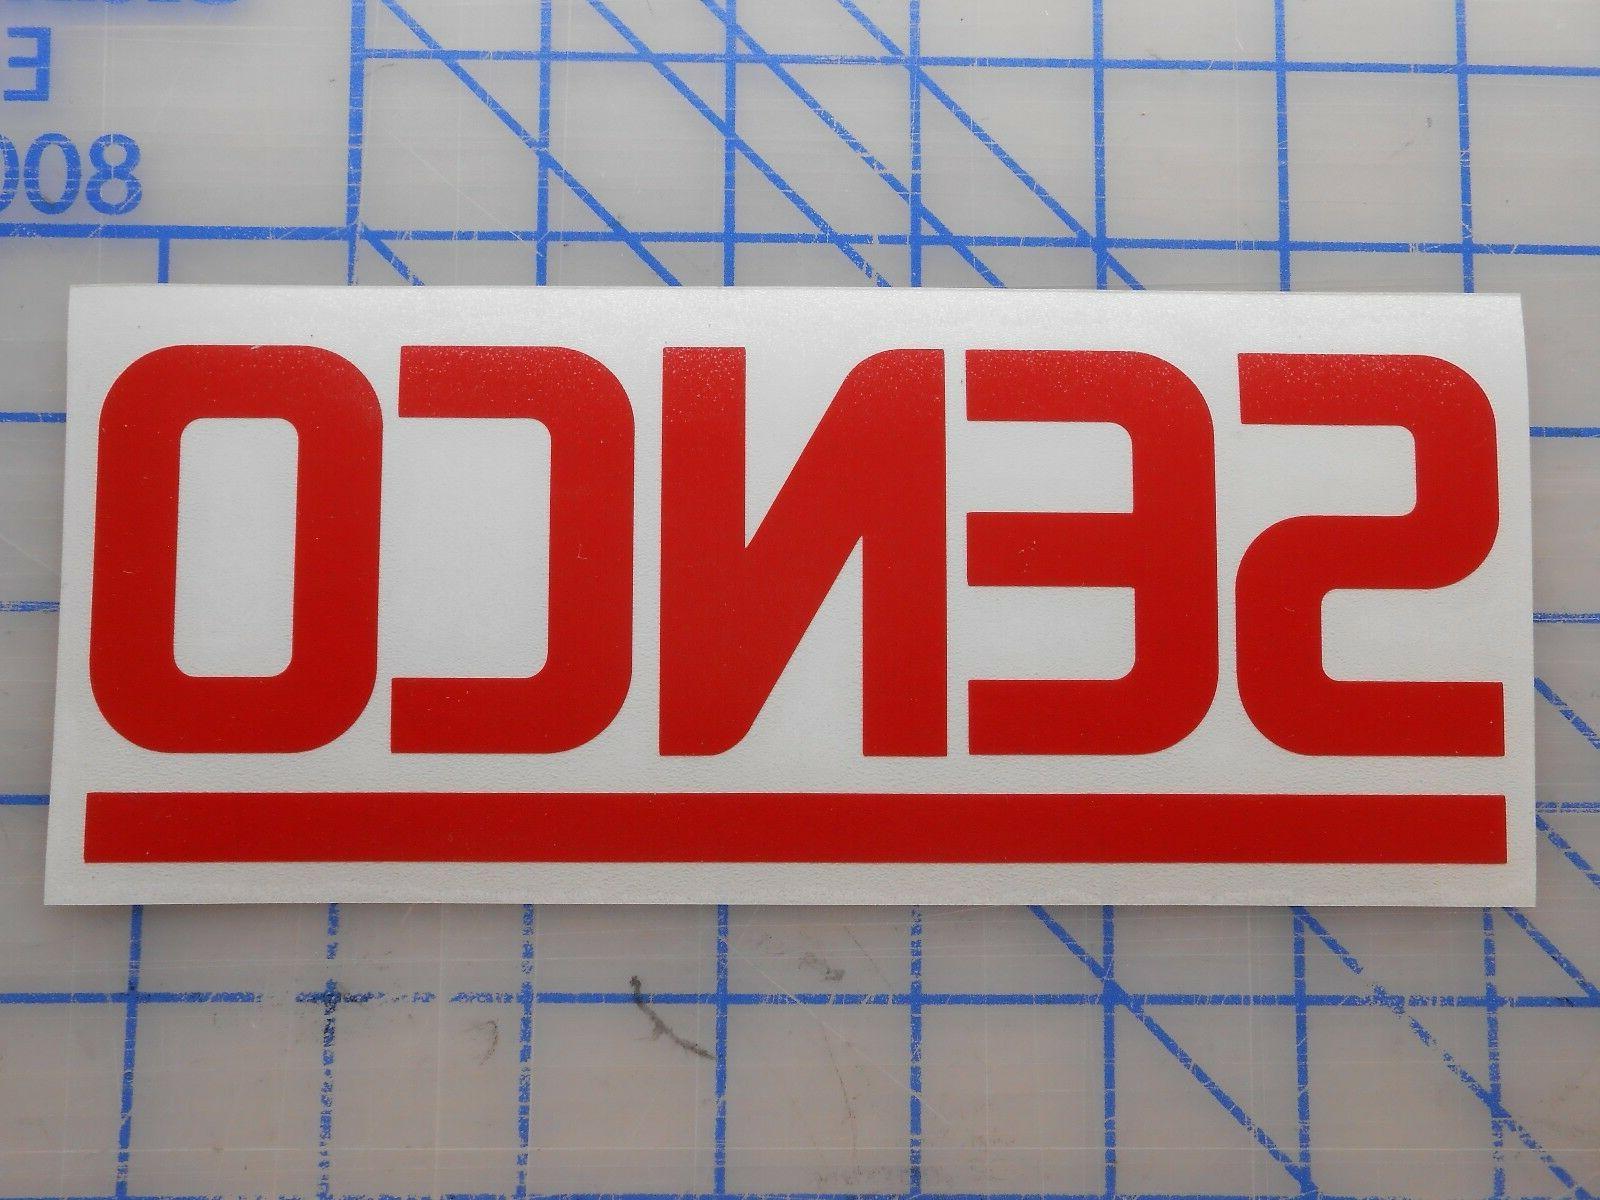 senco decal sticker 5 5 7 5